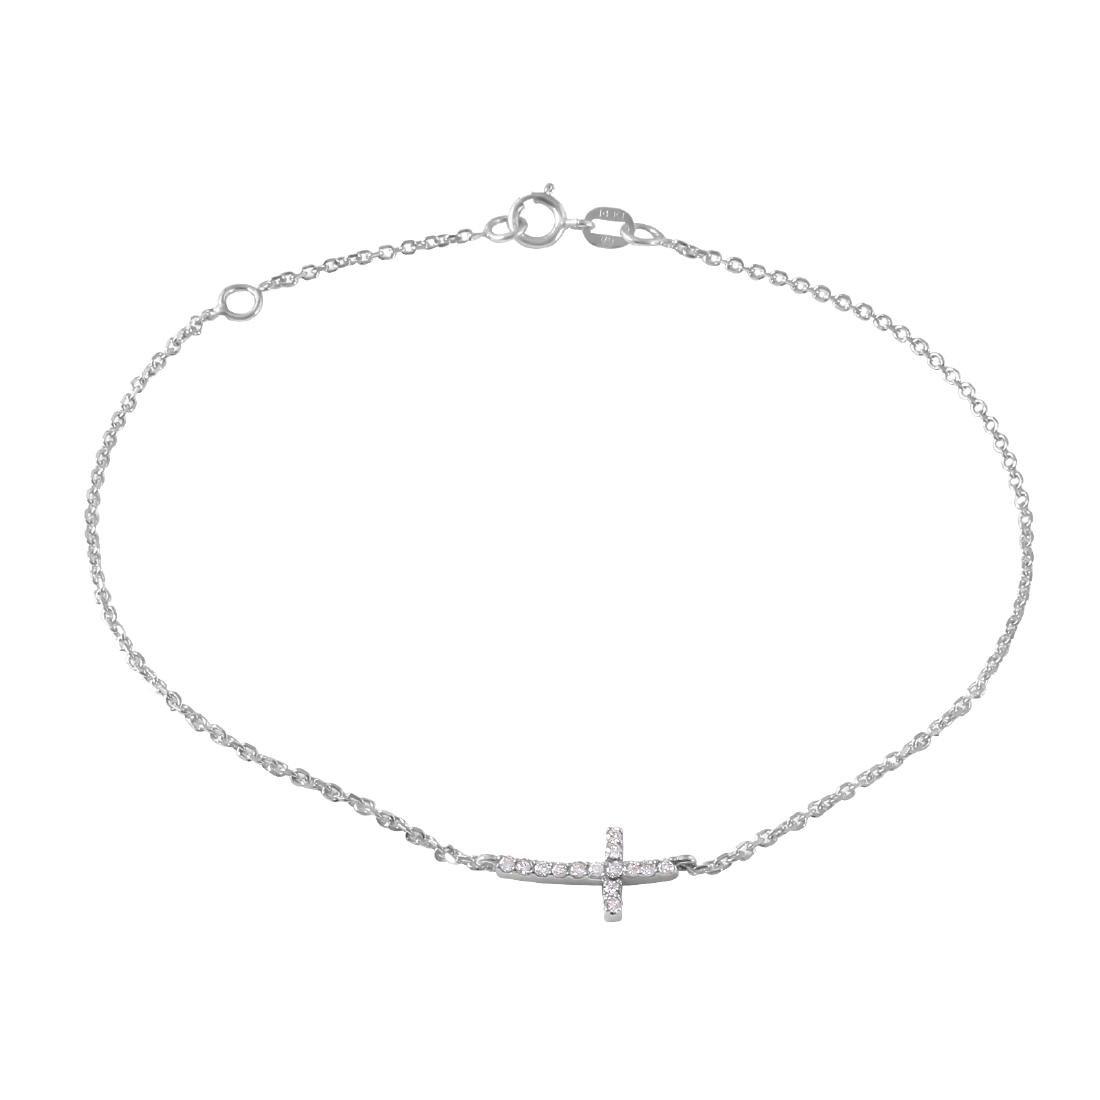 0.10 Carat Natural Diamond 18K Solid White Gold